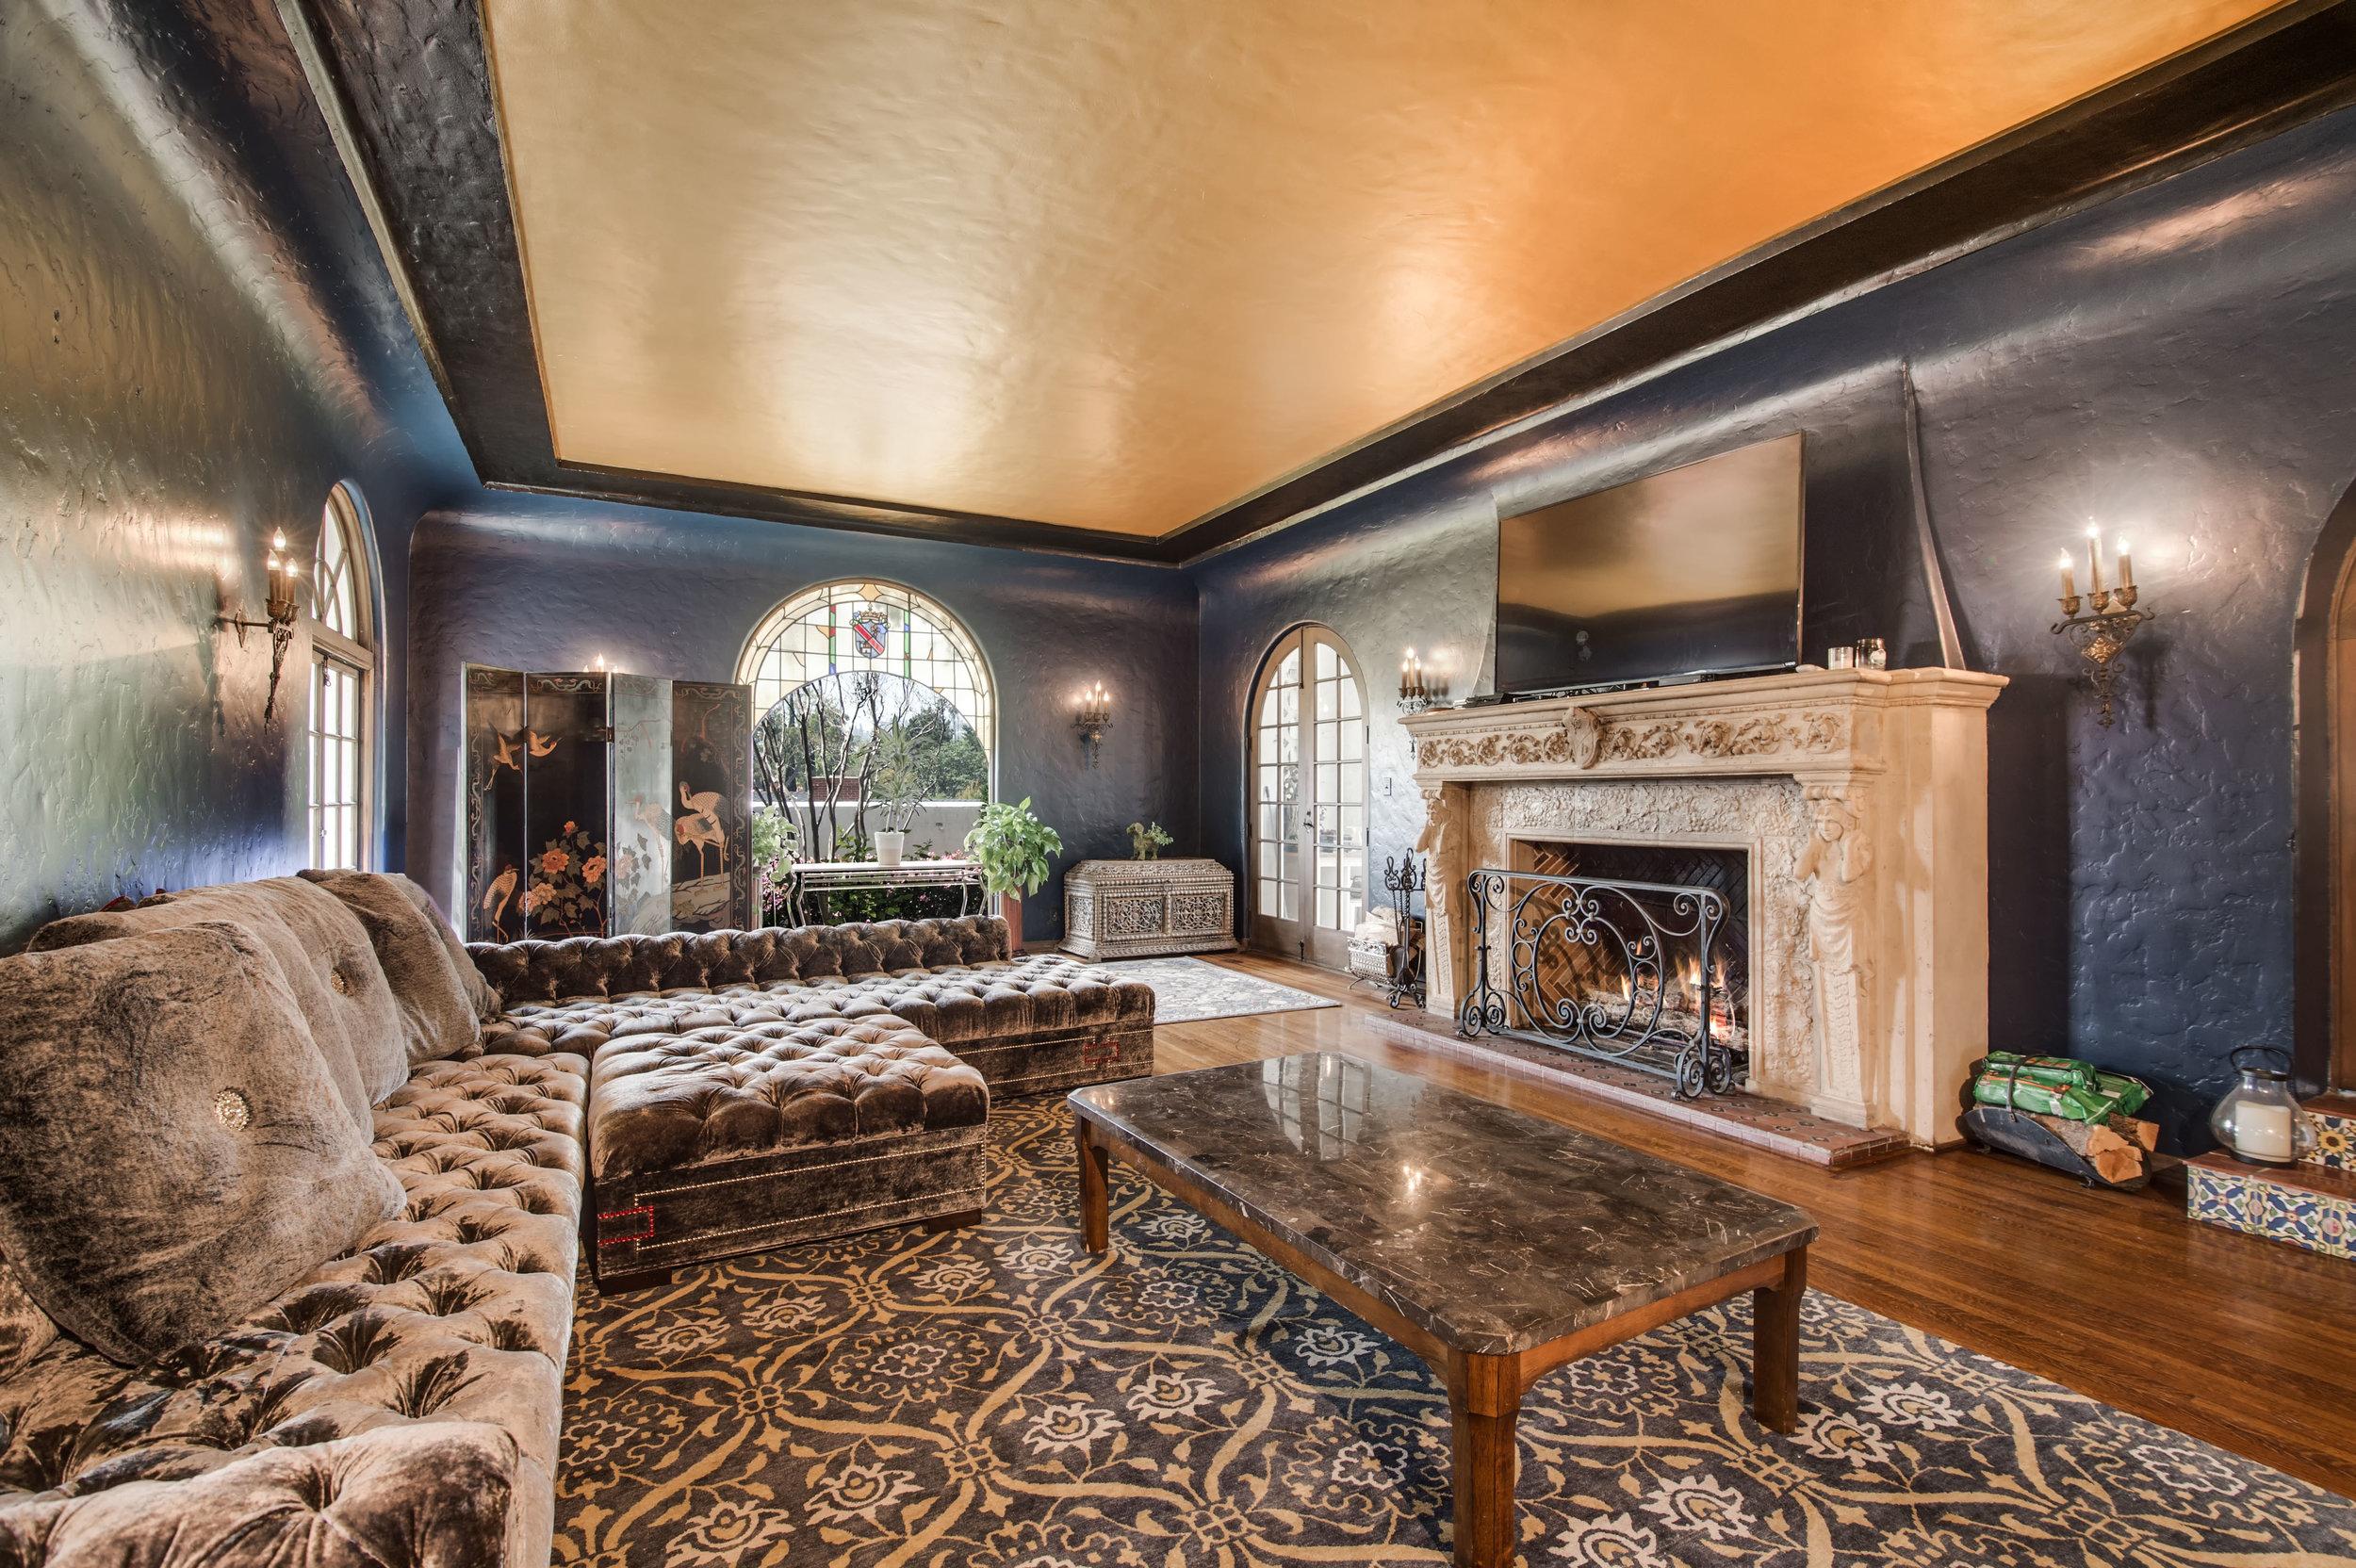 004 Living Room 4915 Los Feliz For Sale Los Angeles Lease The Malibu Life Team Luxury Real Estate.jpg